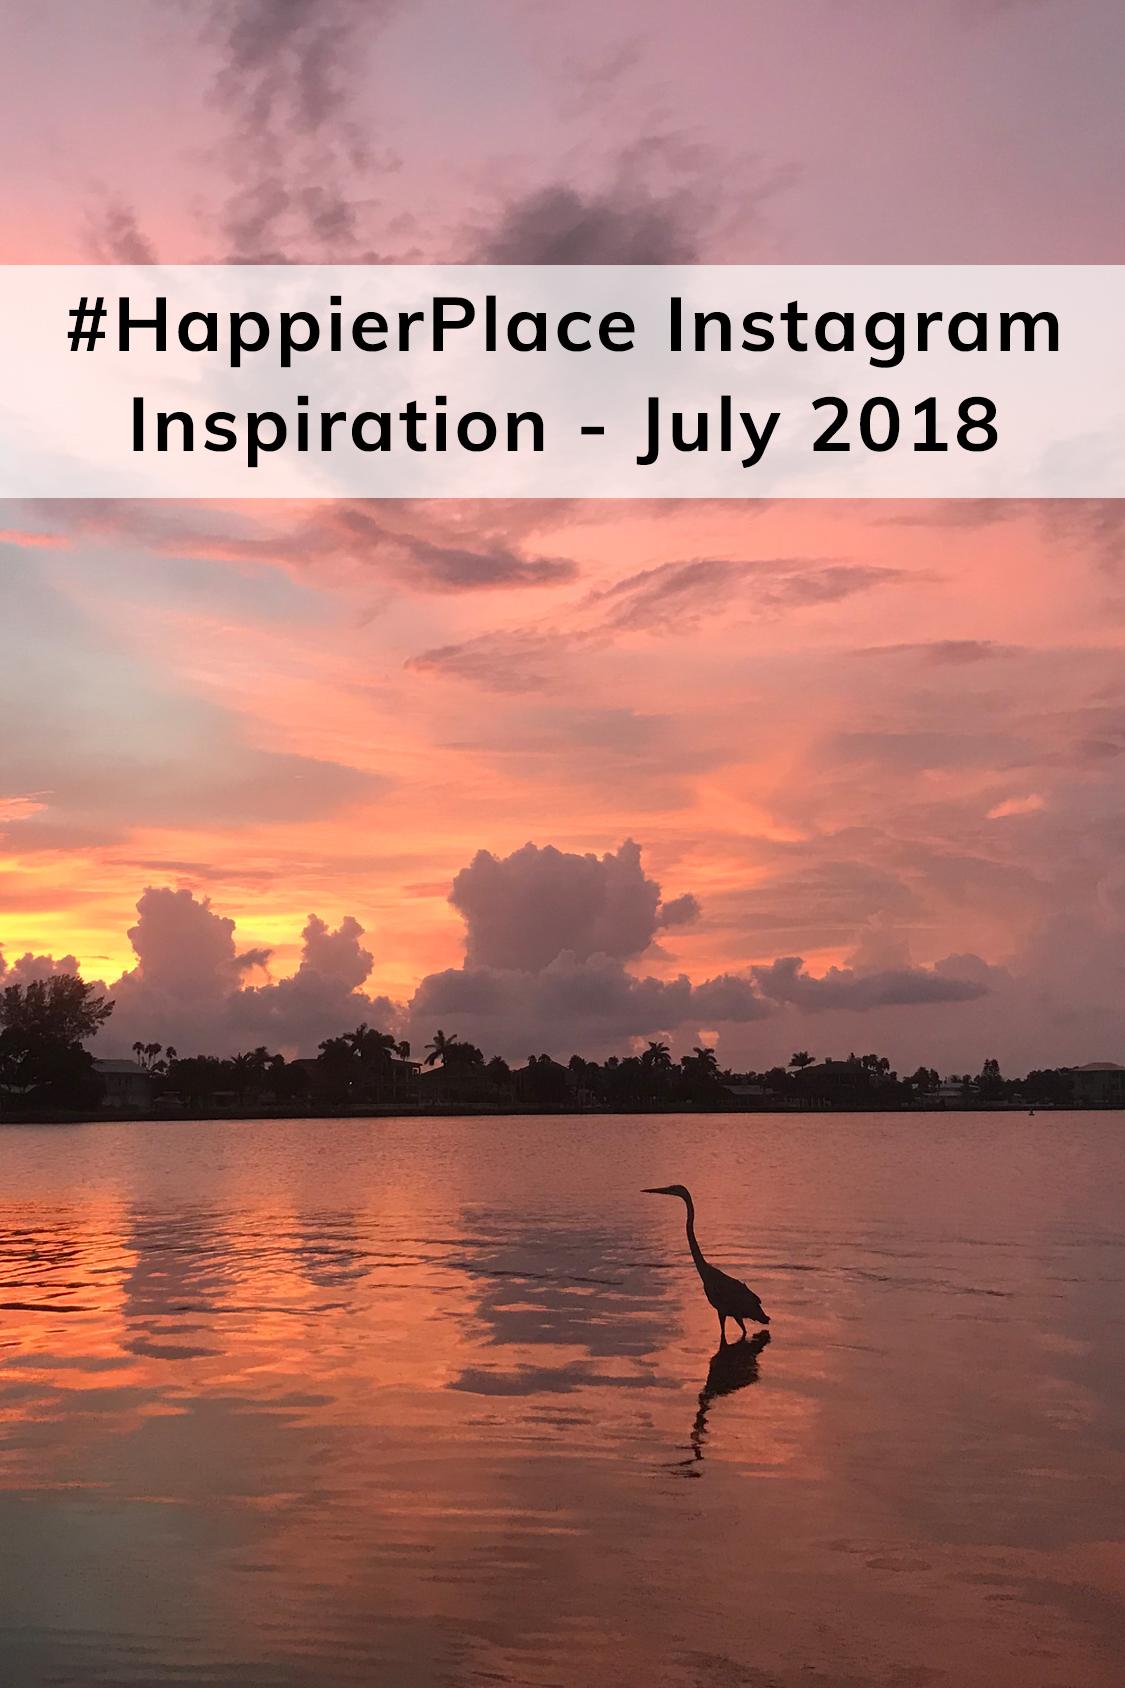 #HappierPlace Instagram Inspiration – July 2018